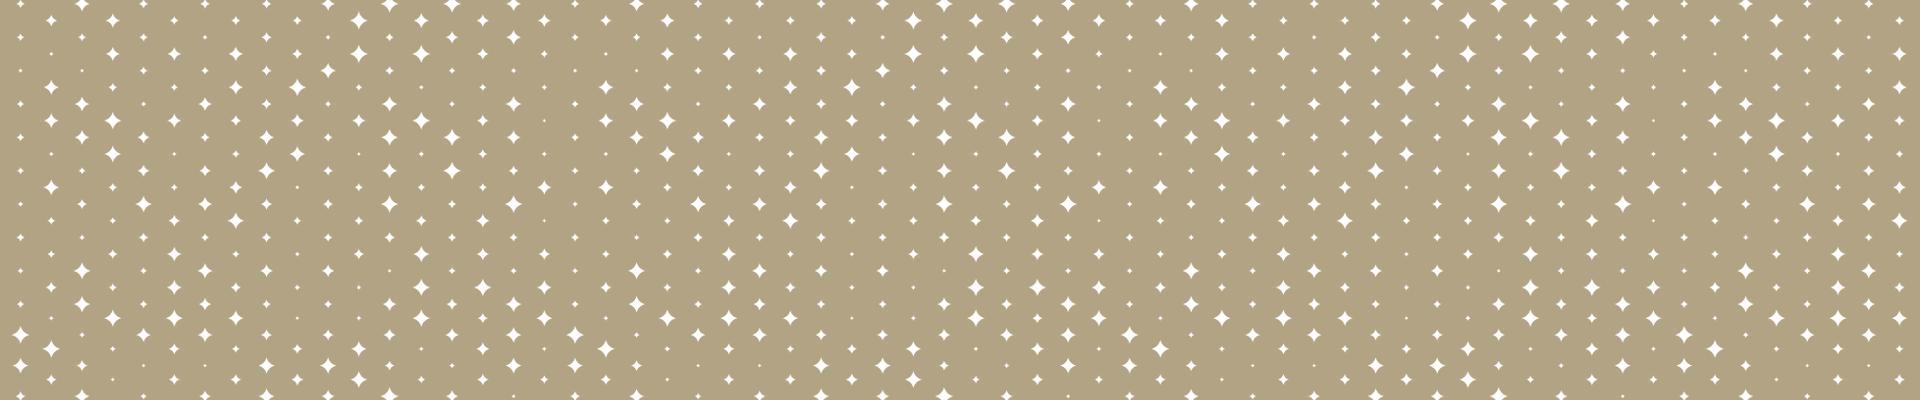 dus-pattern